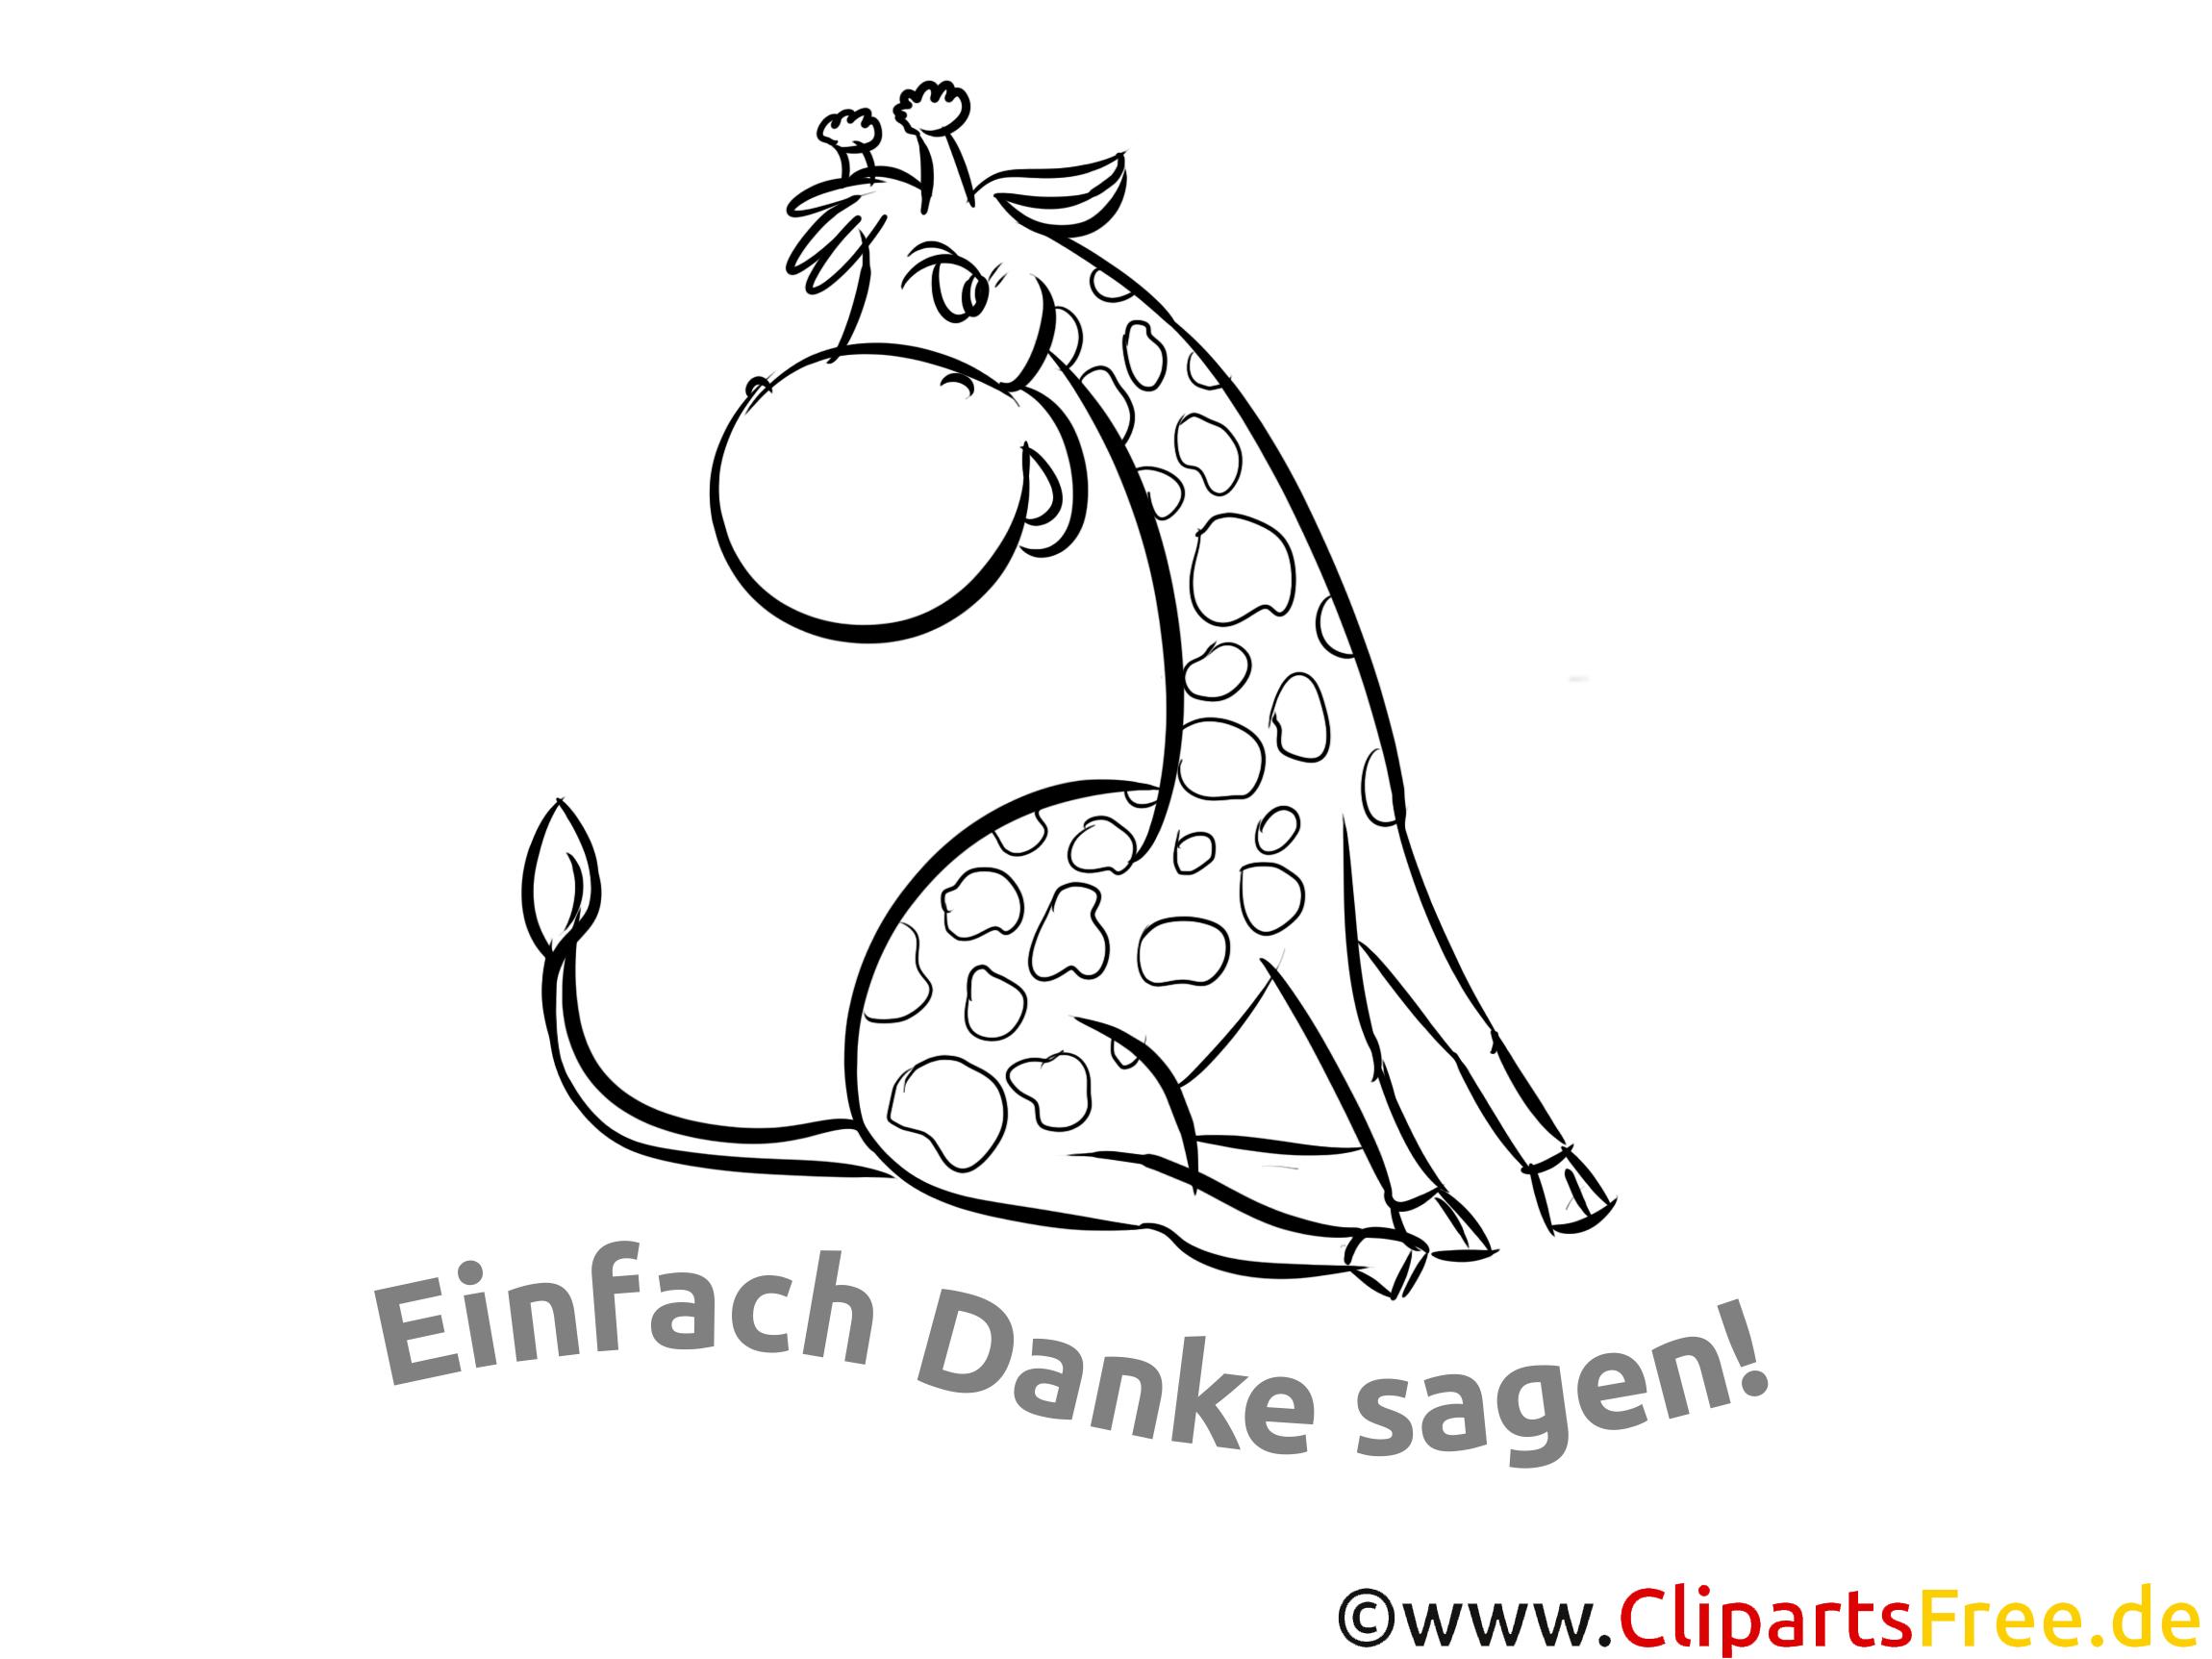 giraffe dankeskarte selber drucken. Black Bedroom Furniture Sets. Home Design Ideas